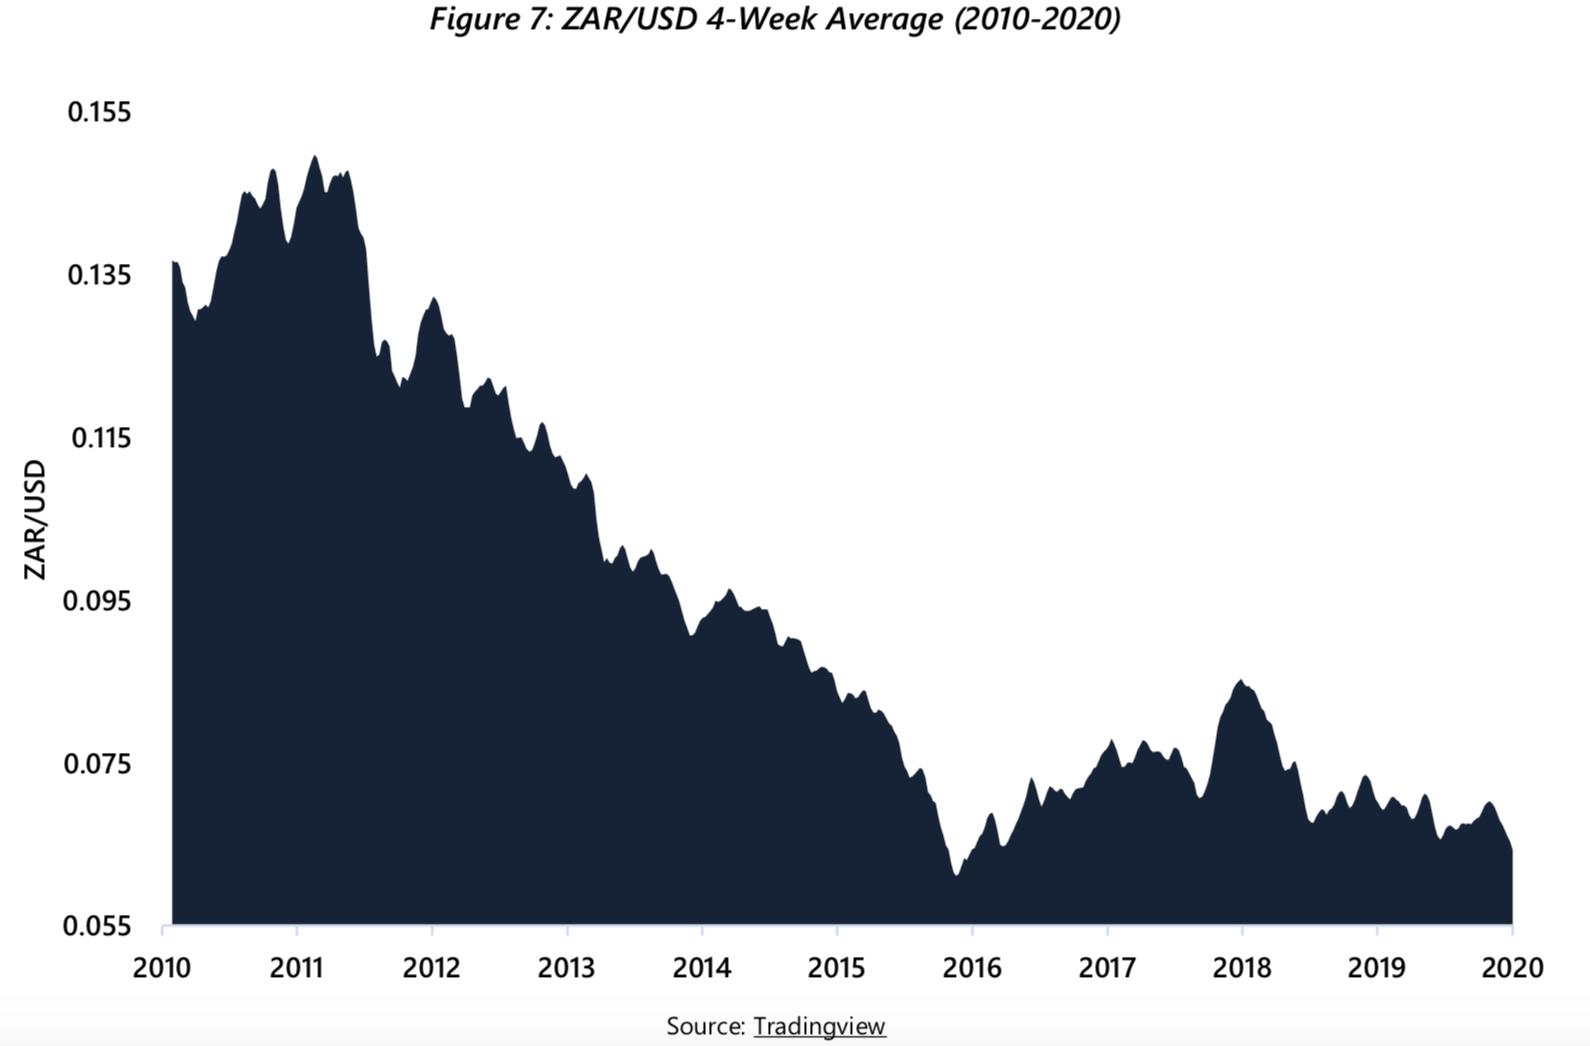 ZAR/USD graph